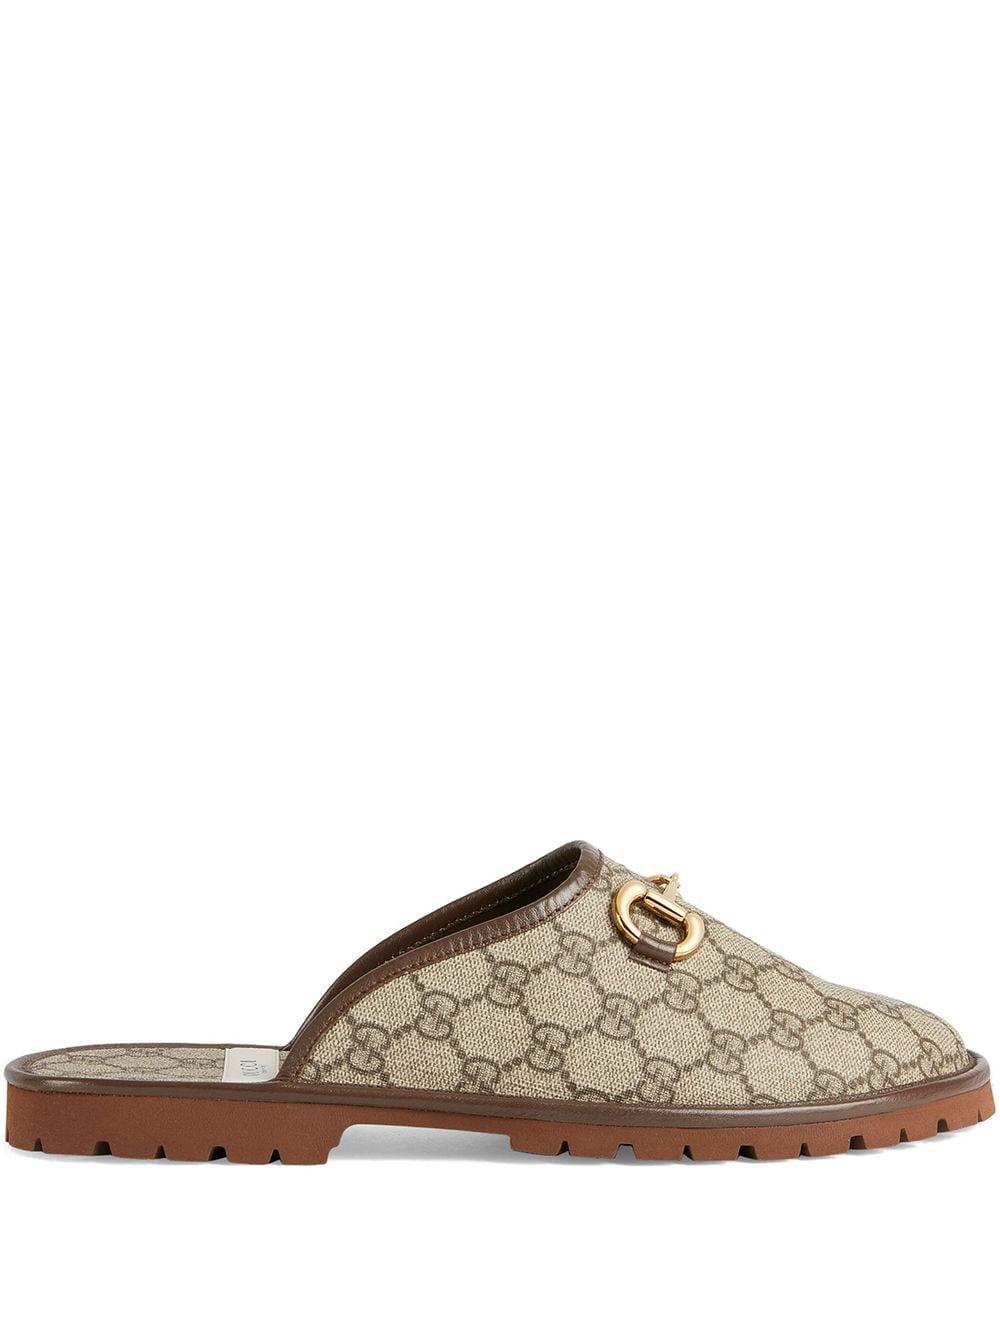 Gucci GG monogram horsebit-detail slippers - Nude